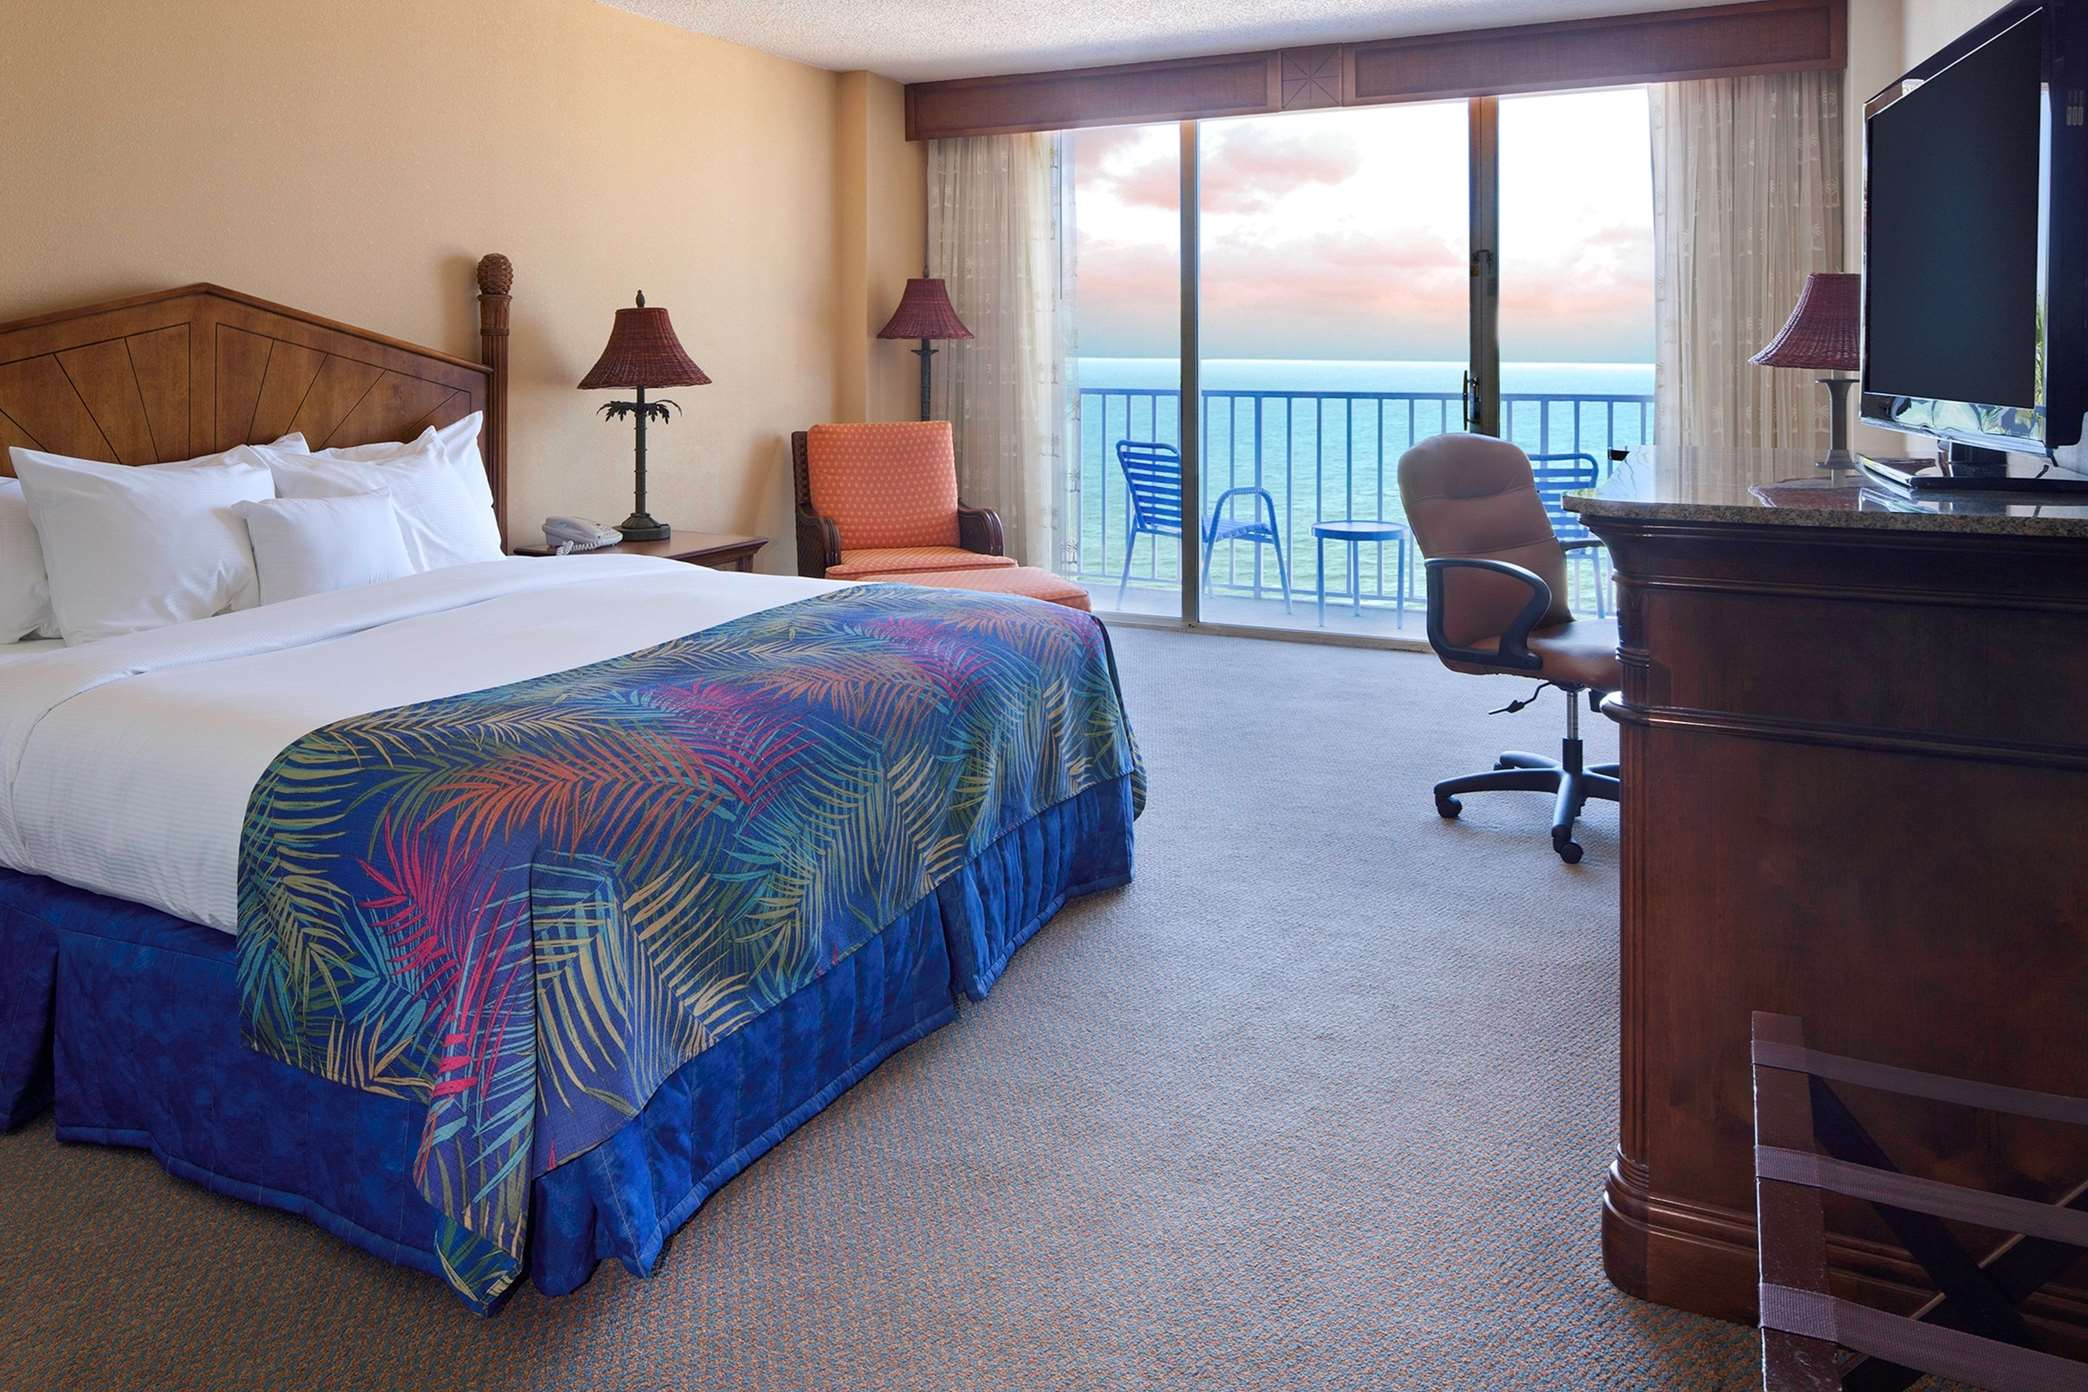 DoubleTree Beach Resort by Hilton Hotel Tampa Bay - North Redington Beach image 9